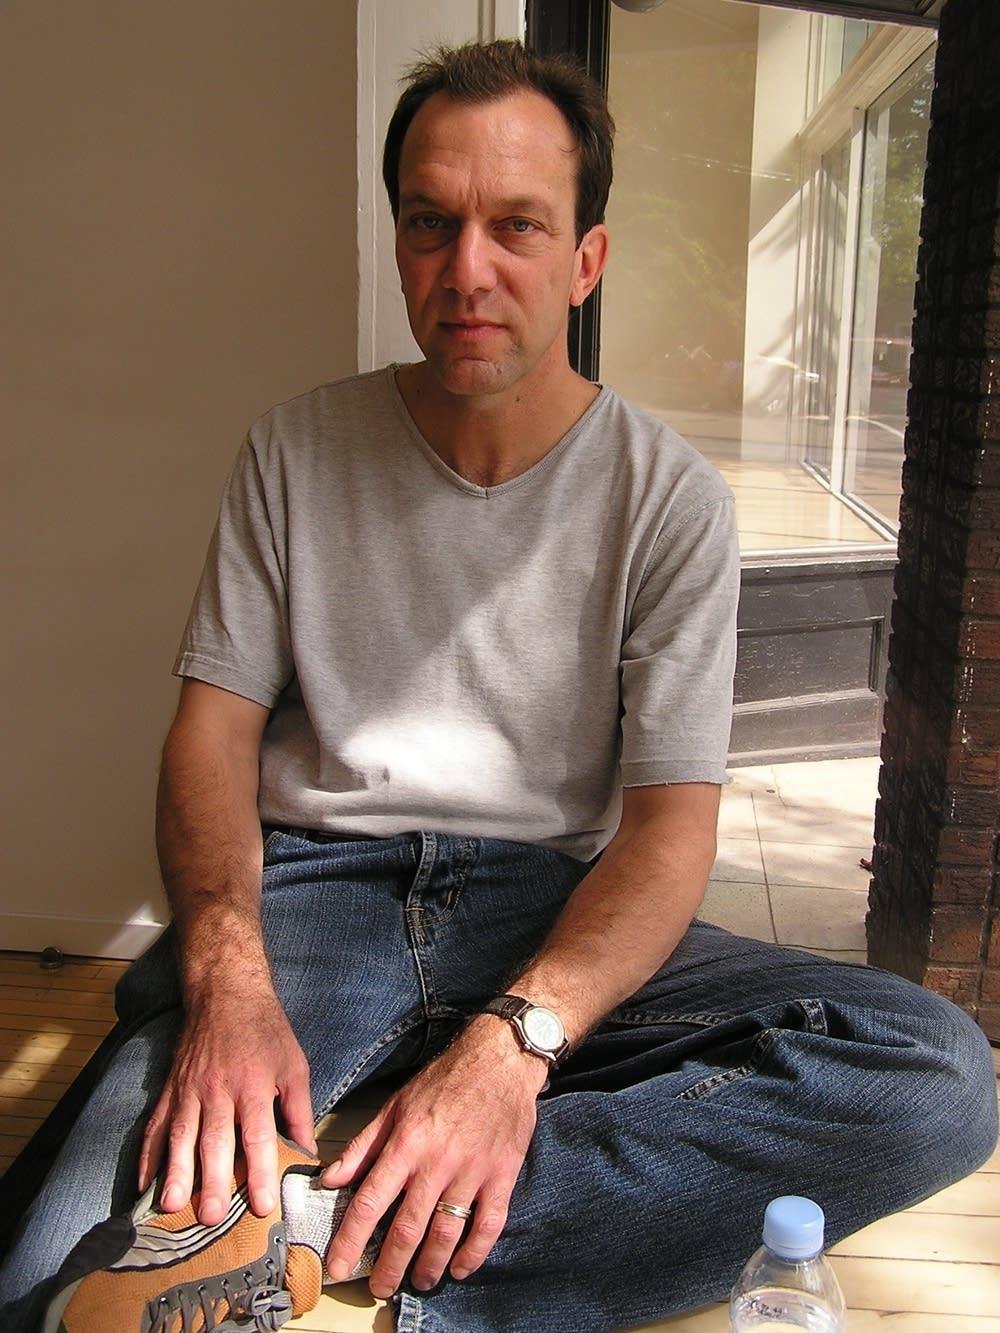 Paul Shambroom